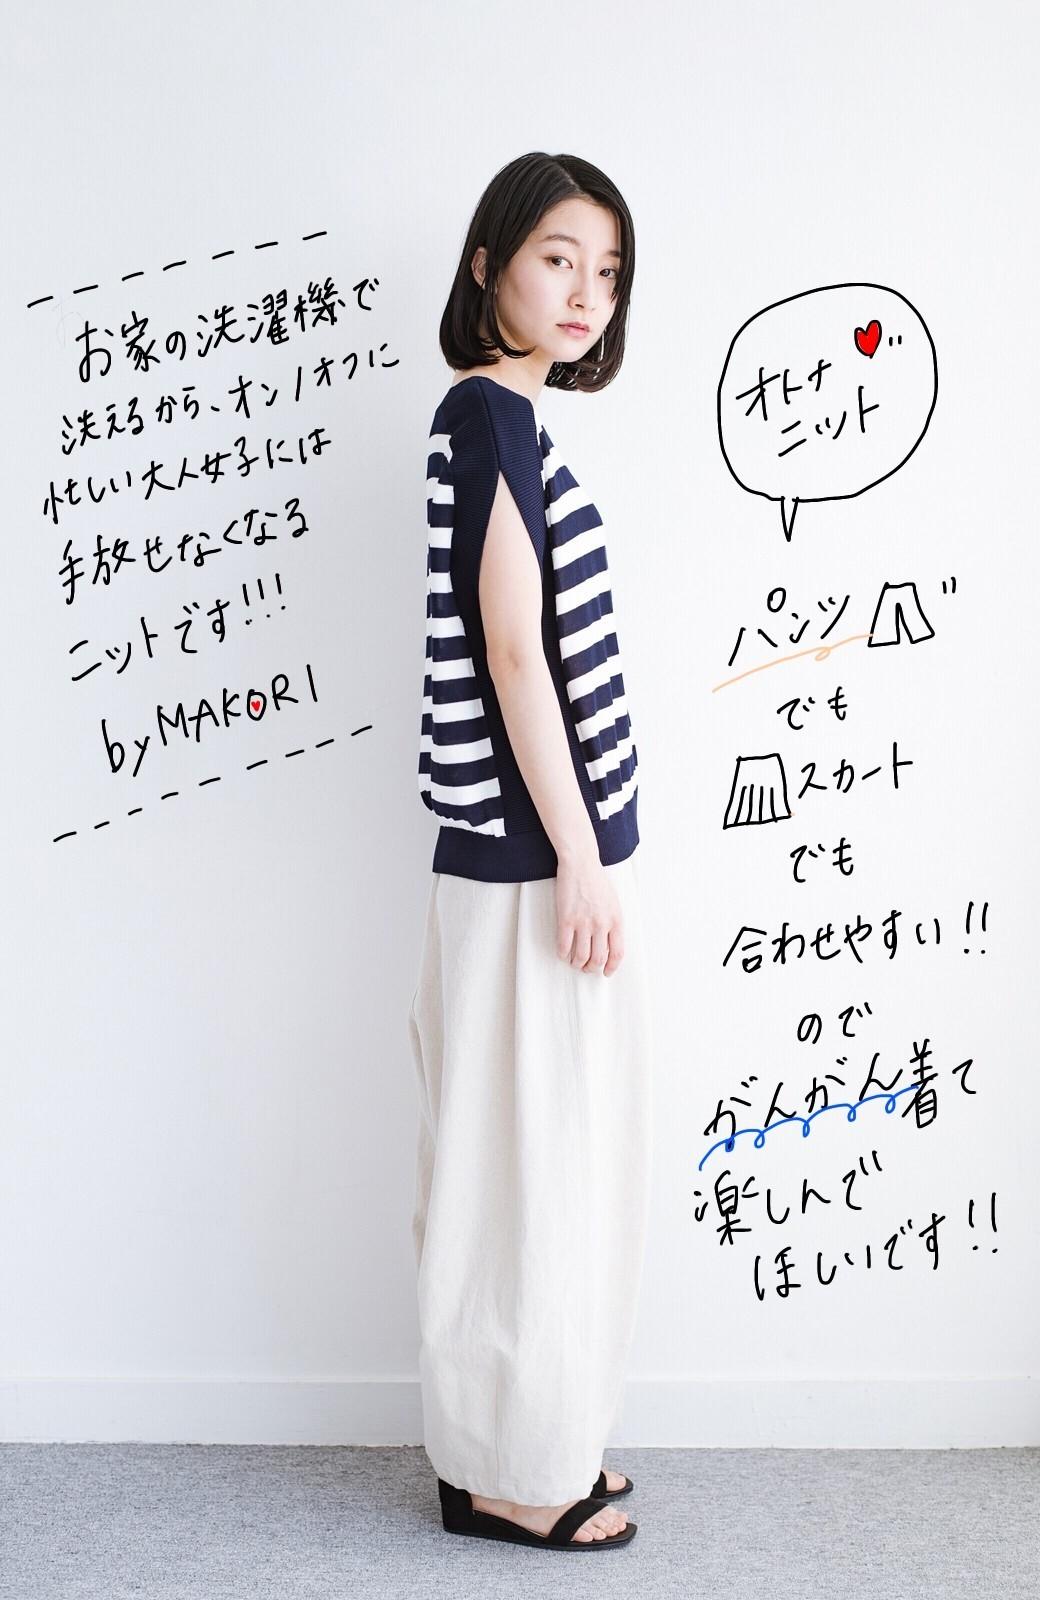 haco! カットソー感覚で着られる 洗えるオトナニットトップス by MAKORI <ブルー系その他>の商品写真9